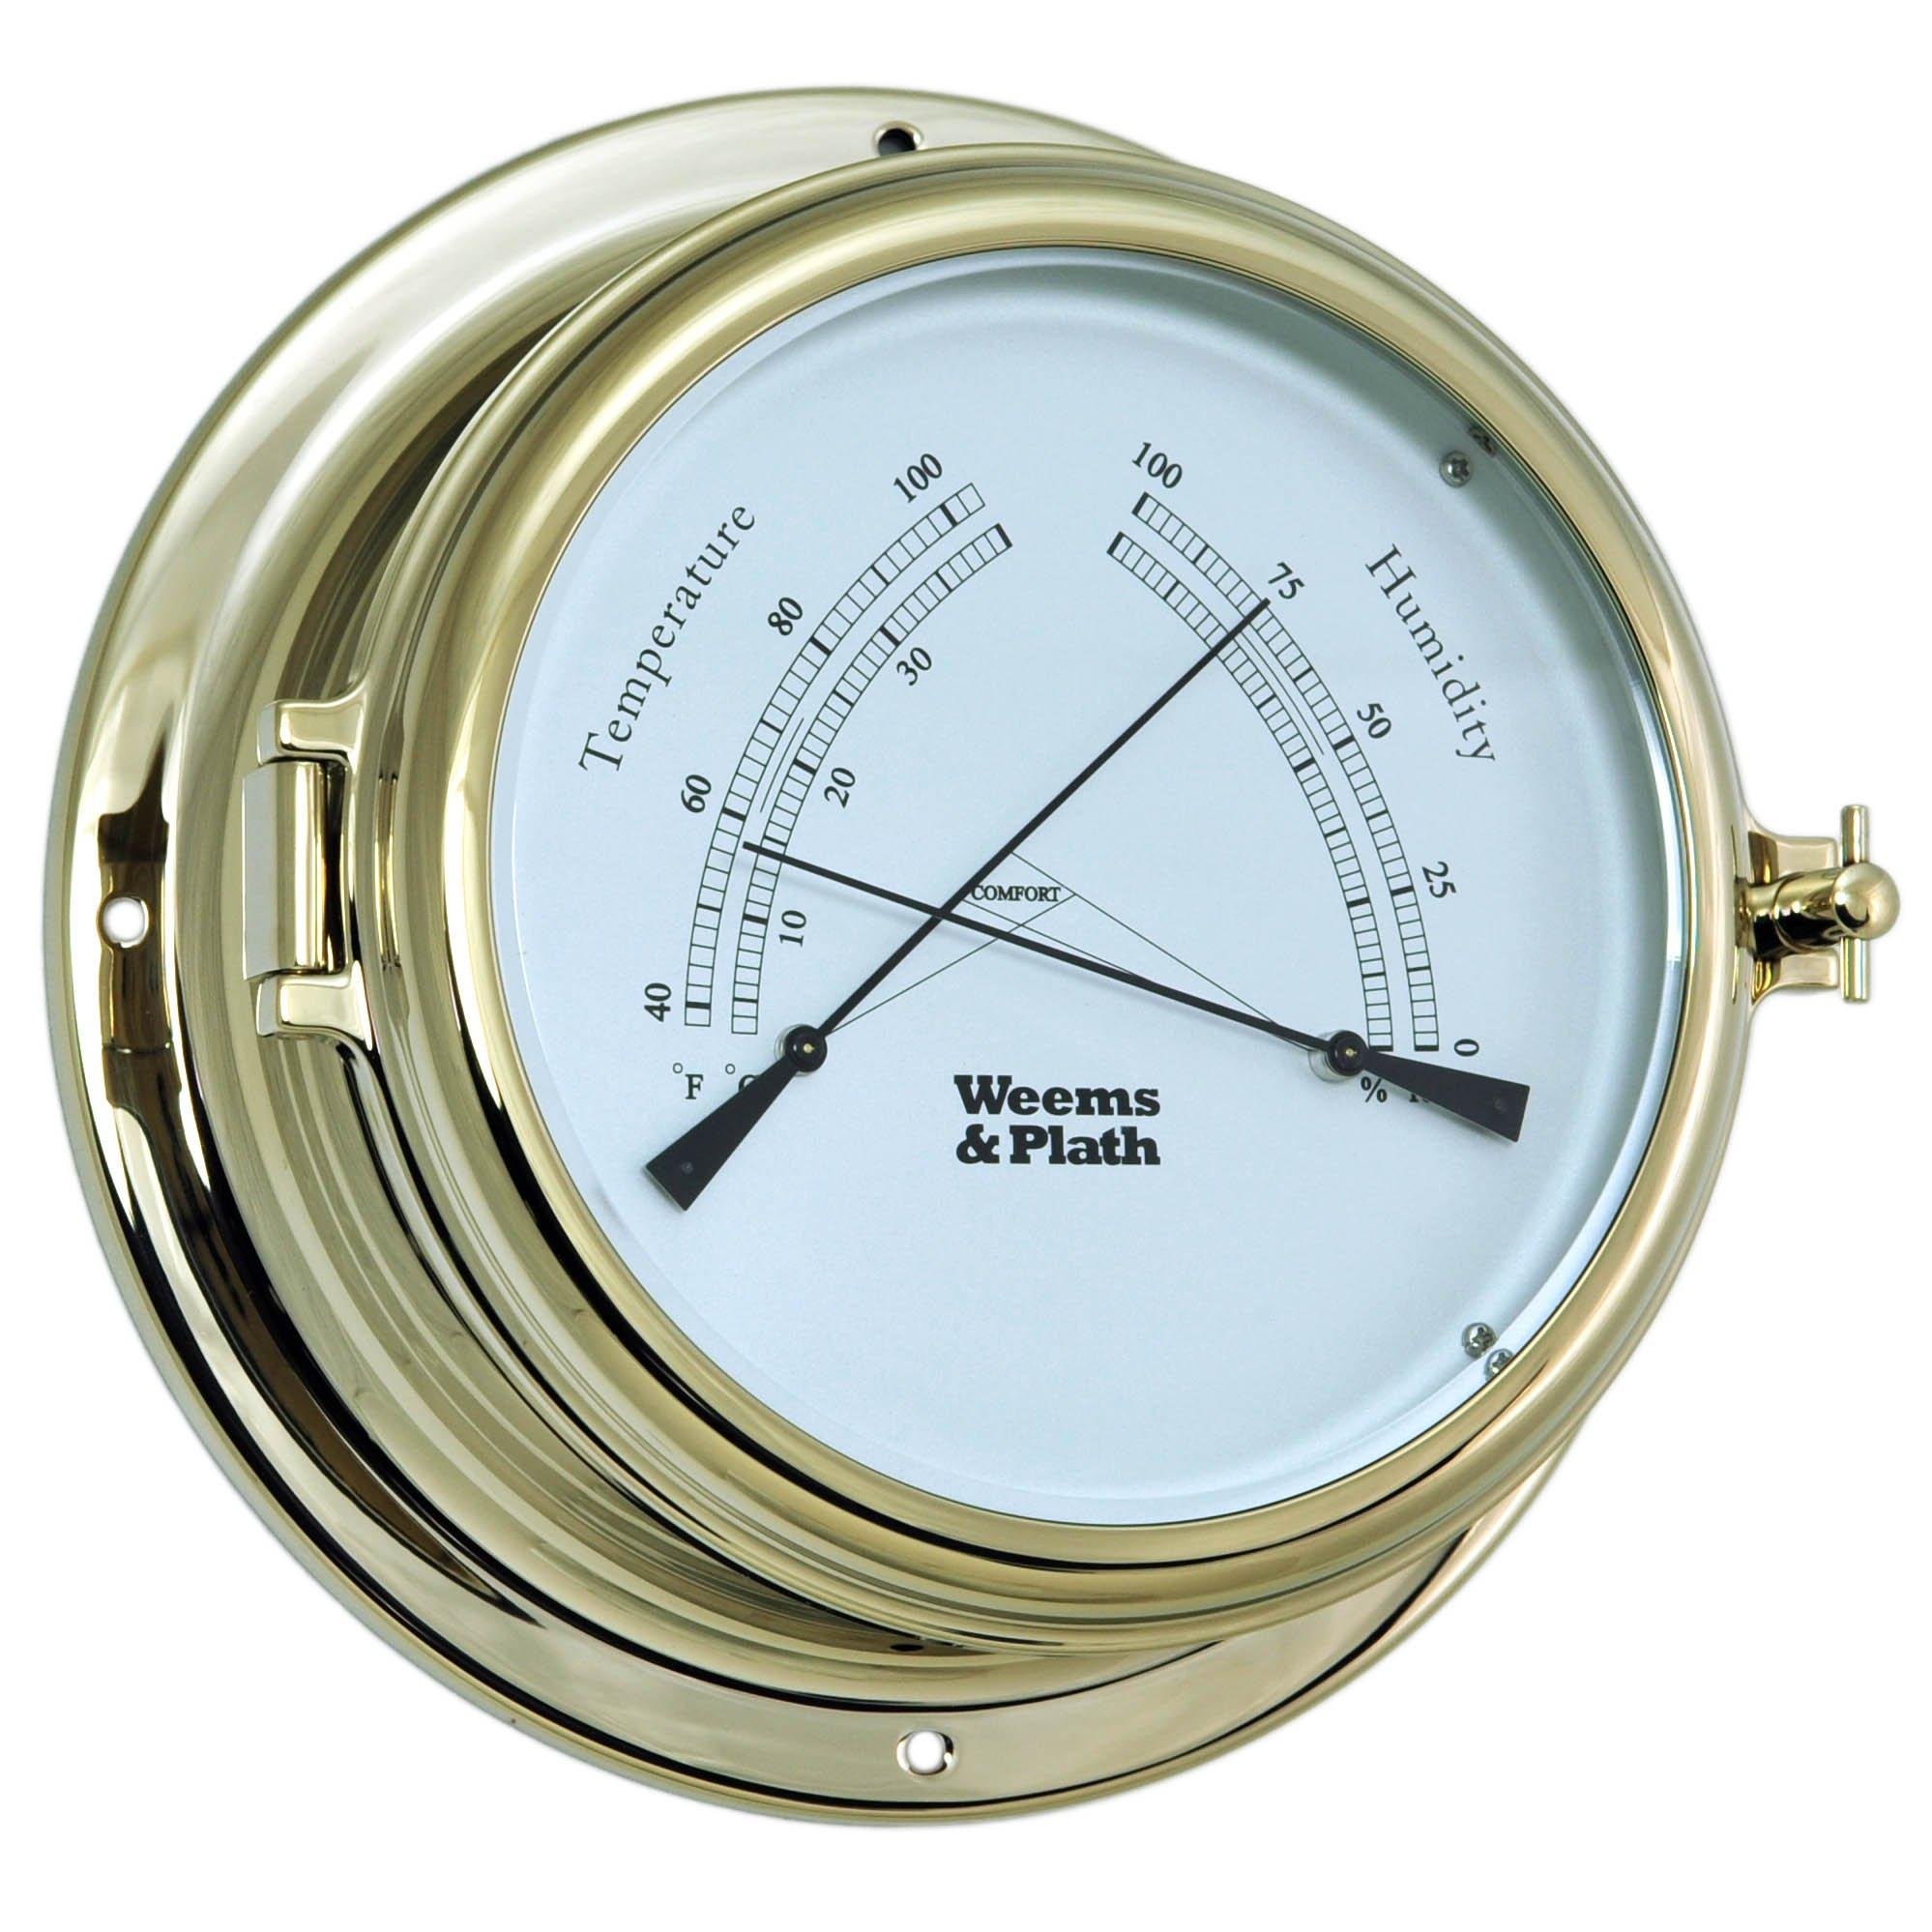 Weems and Plath Endurance II 135 Comfortmeter Brass by Weems & Plath